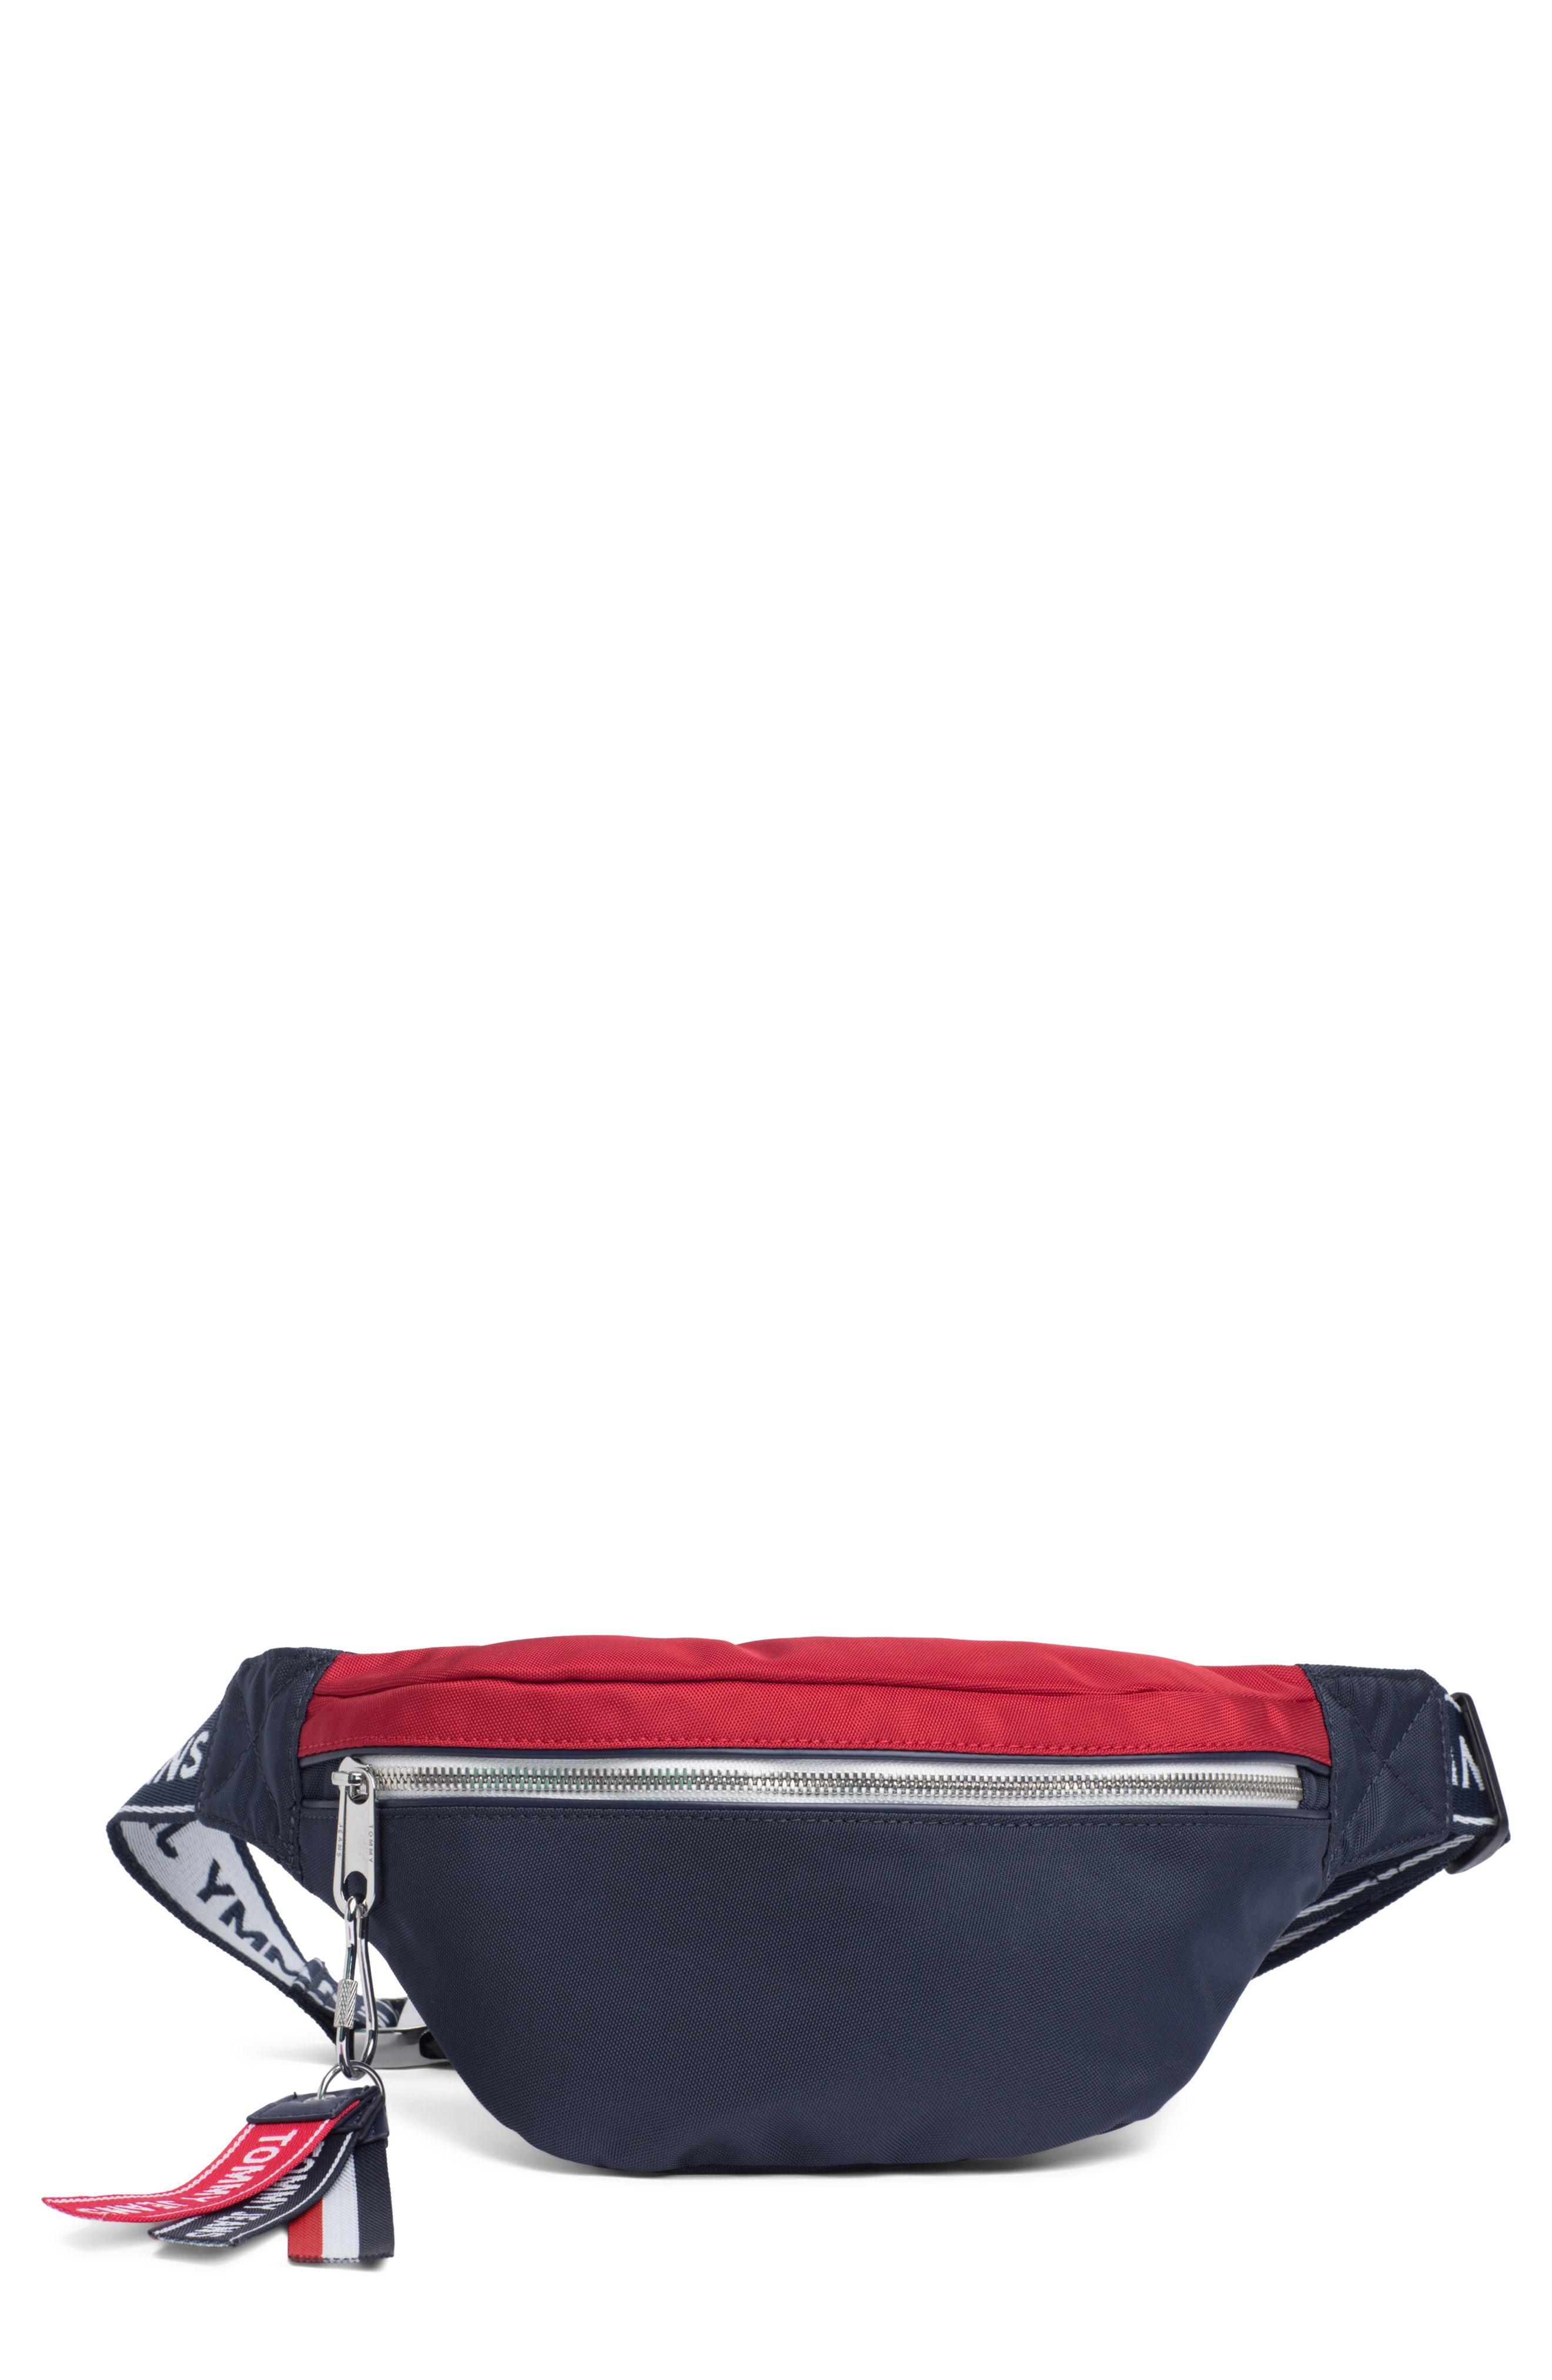 b64ec715 Lyst - Tommy Hilfiger Logo Belt Bag in Red